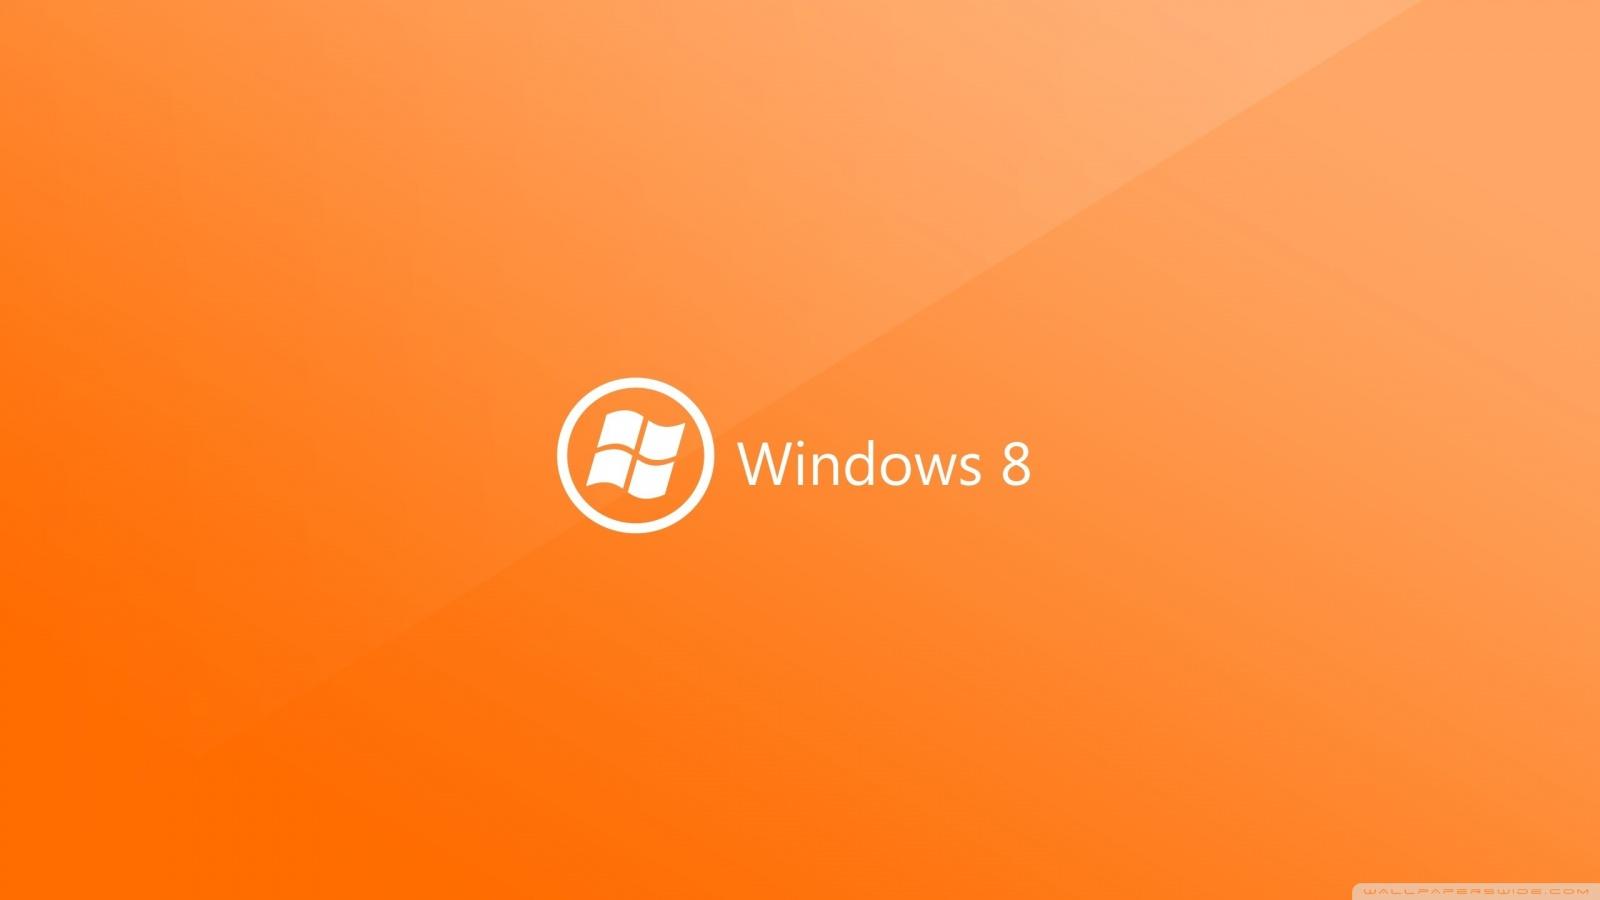 Cute Wallpapers For Dell Laptop Windows 8 On Orange Background 4k Hd Desktop Wallpaper For